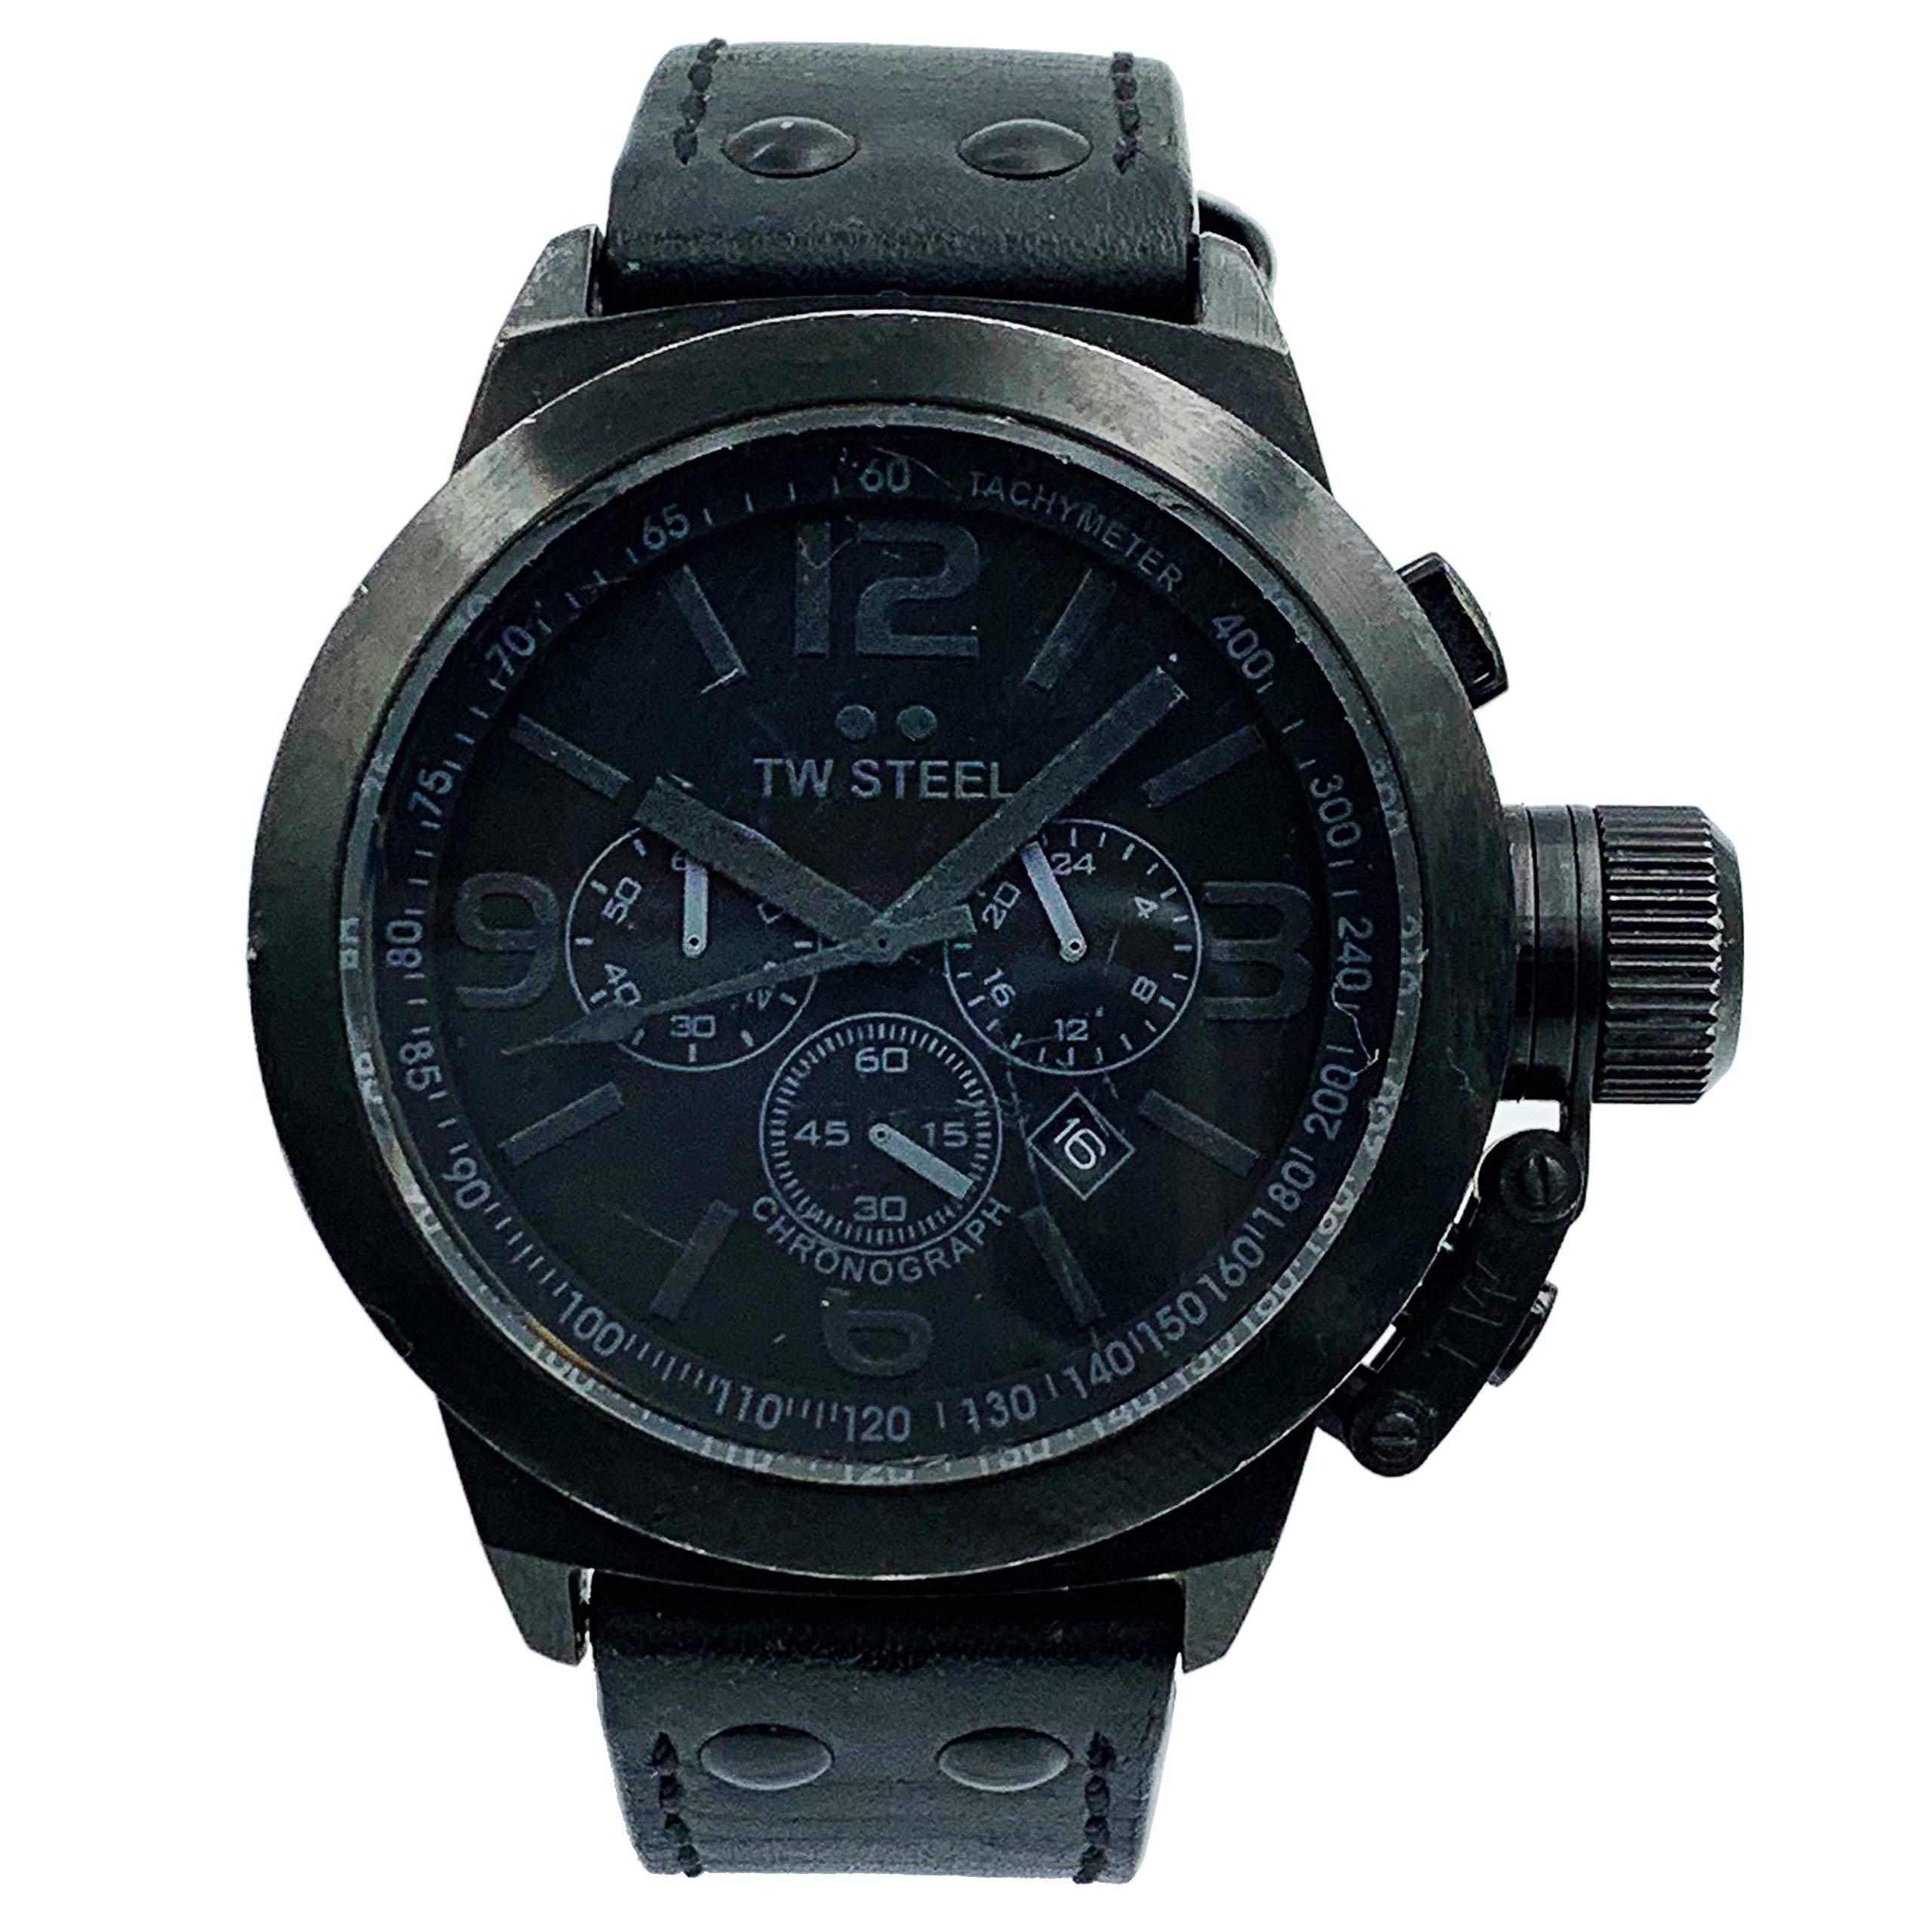 TW Steel CEO Quartz Male Watch TW843 (Certified Pre-Owned)